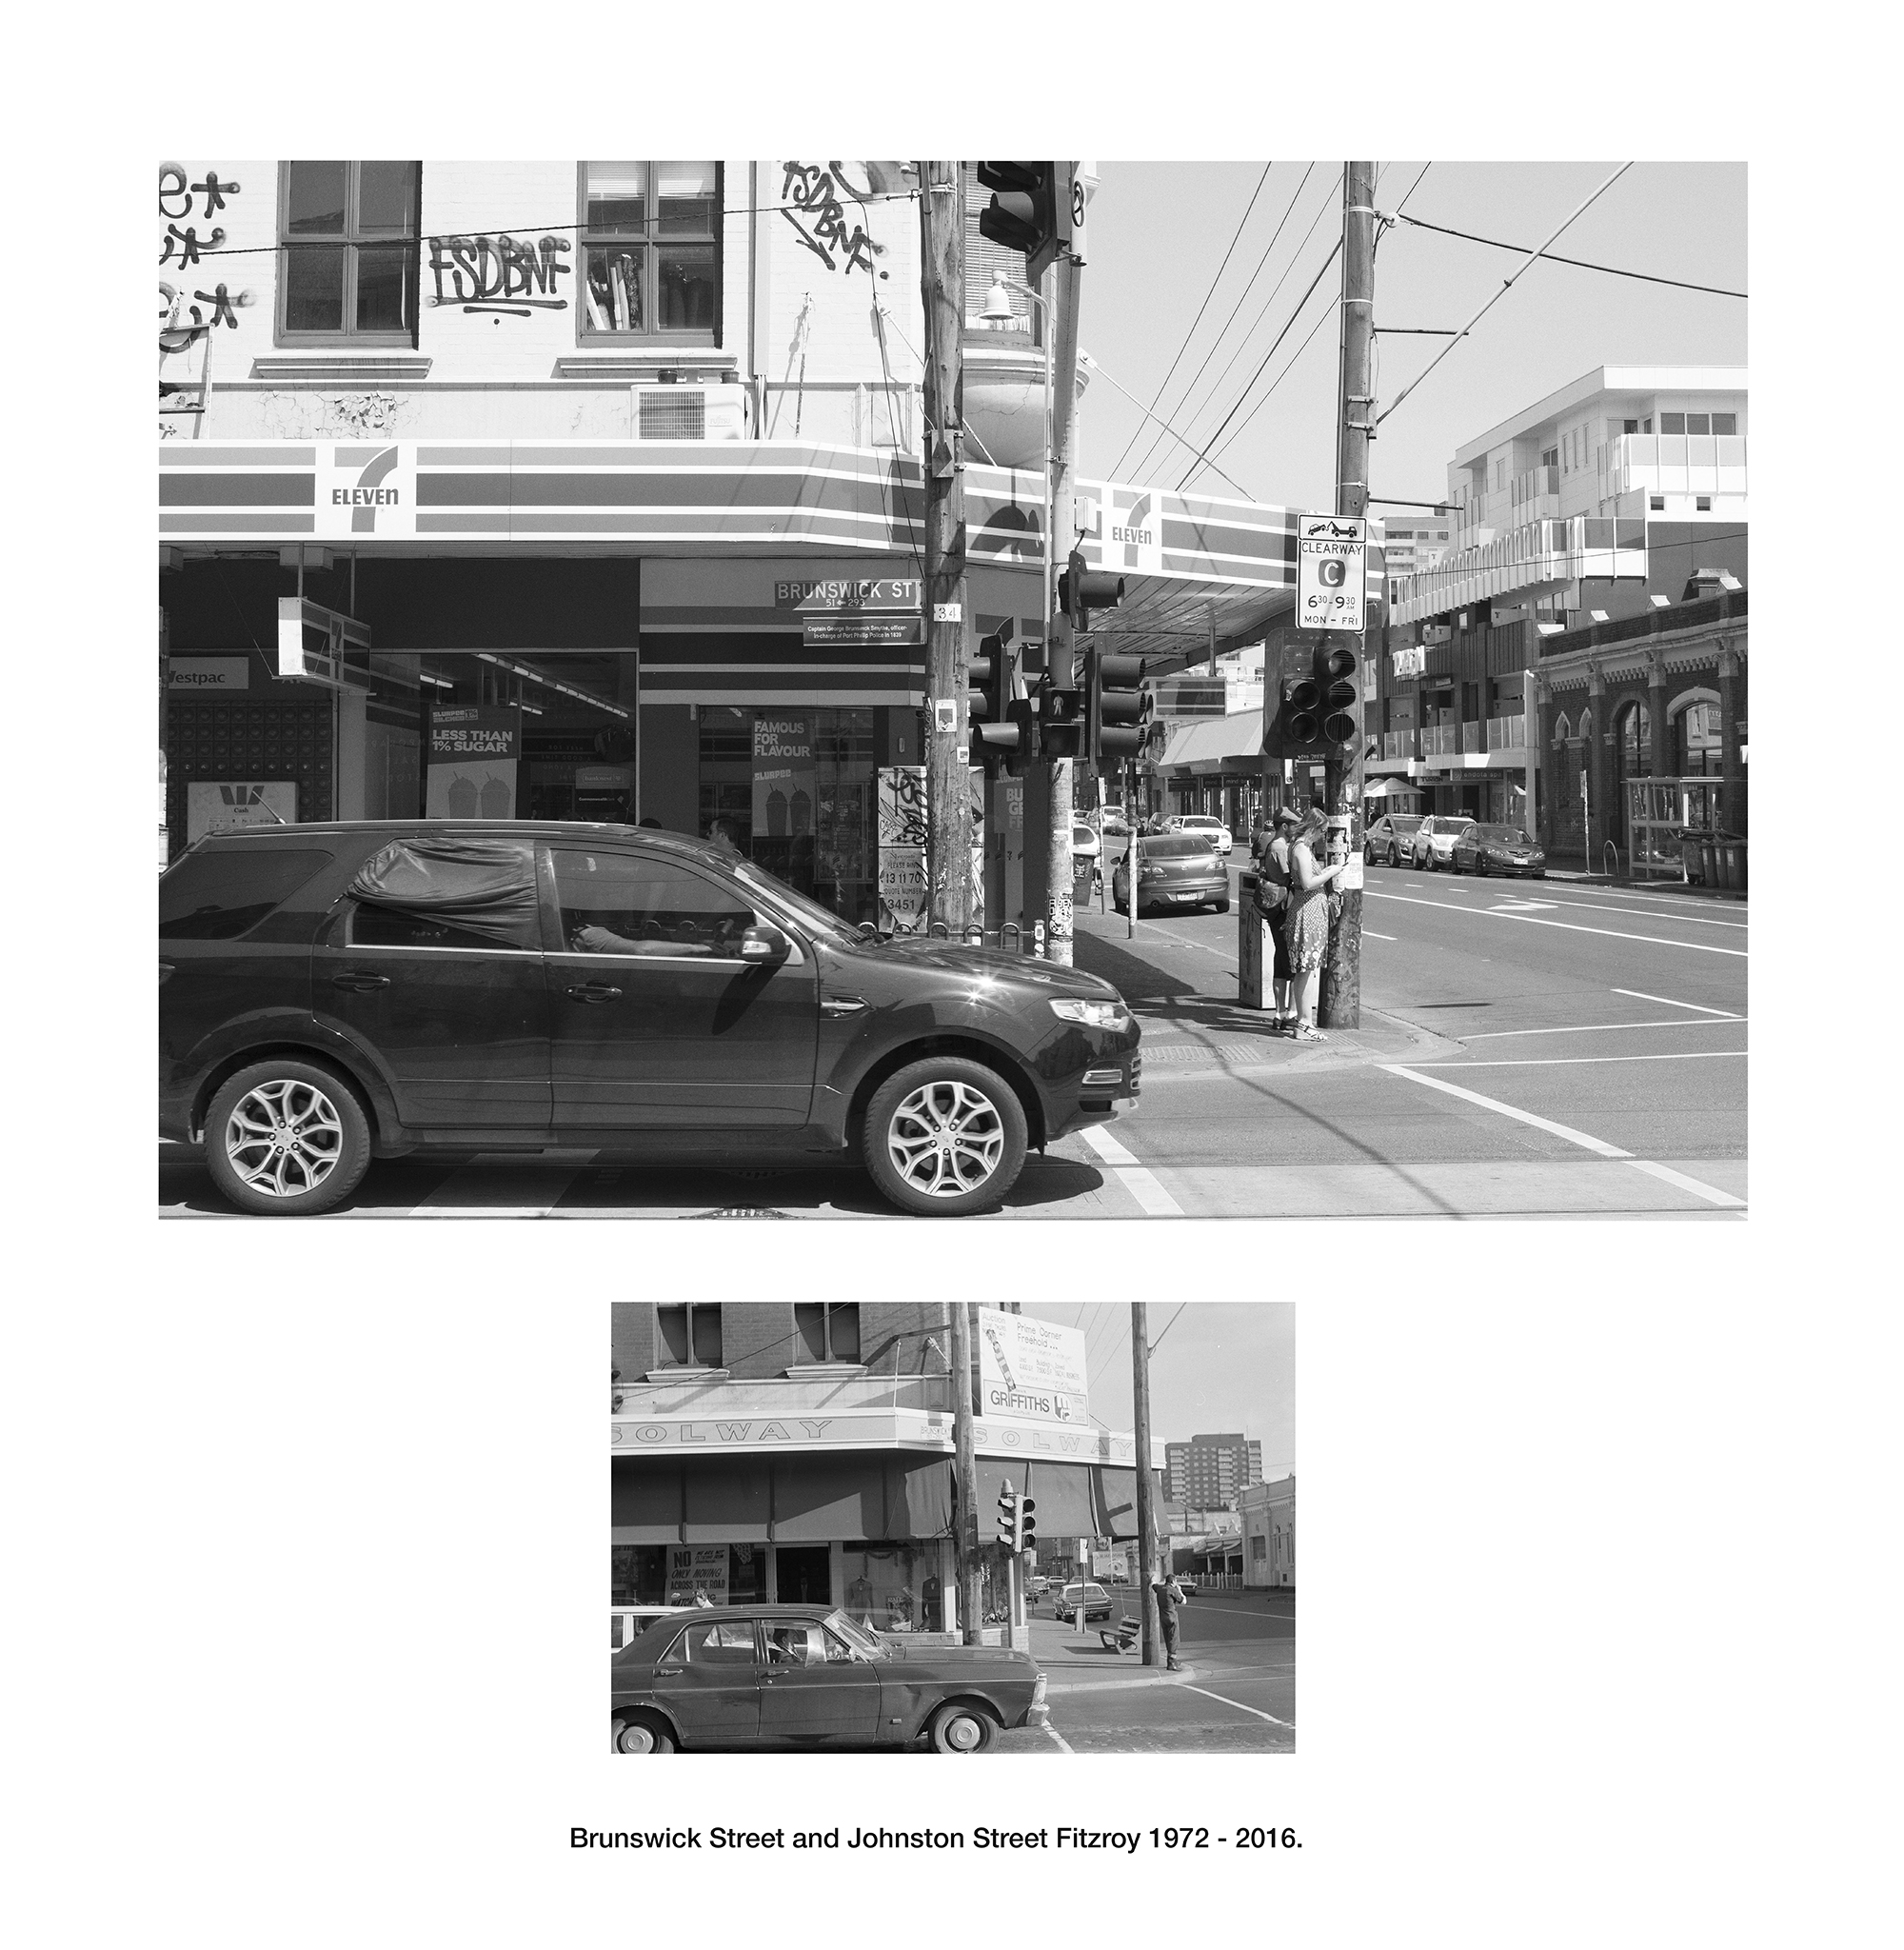 Brunswick Street and Johnston Street Fitzroy 1972 - 2016.